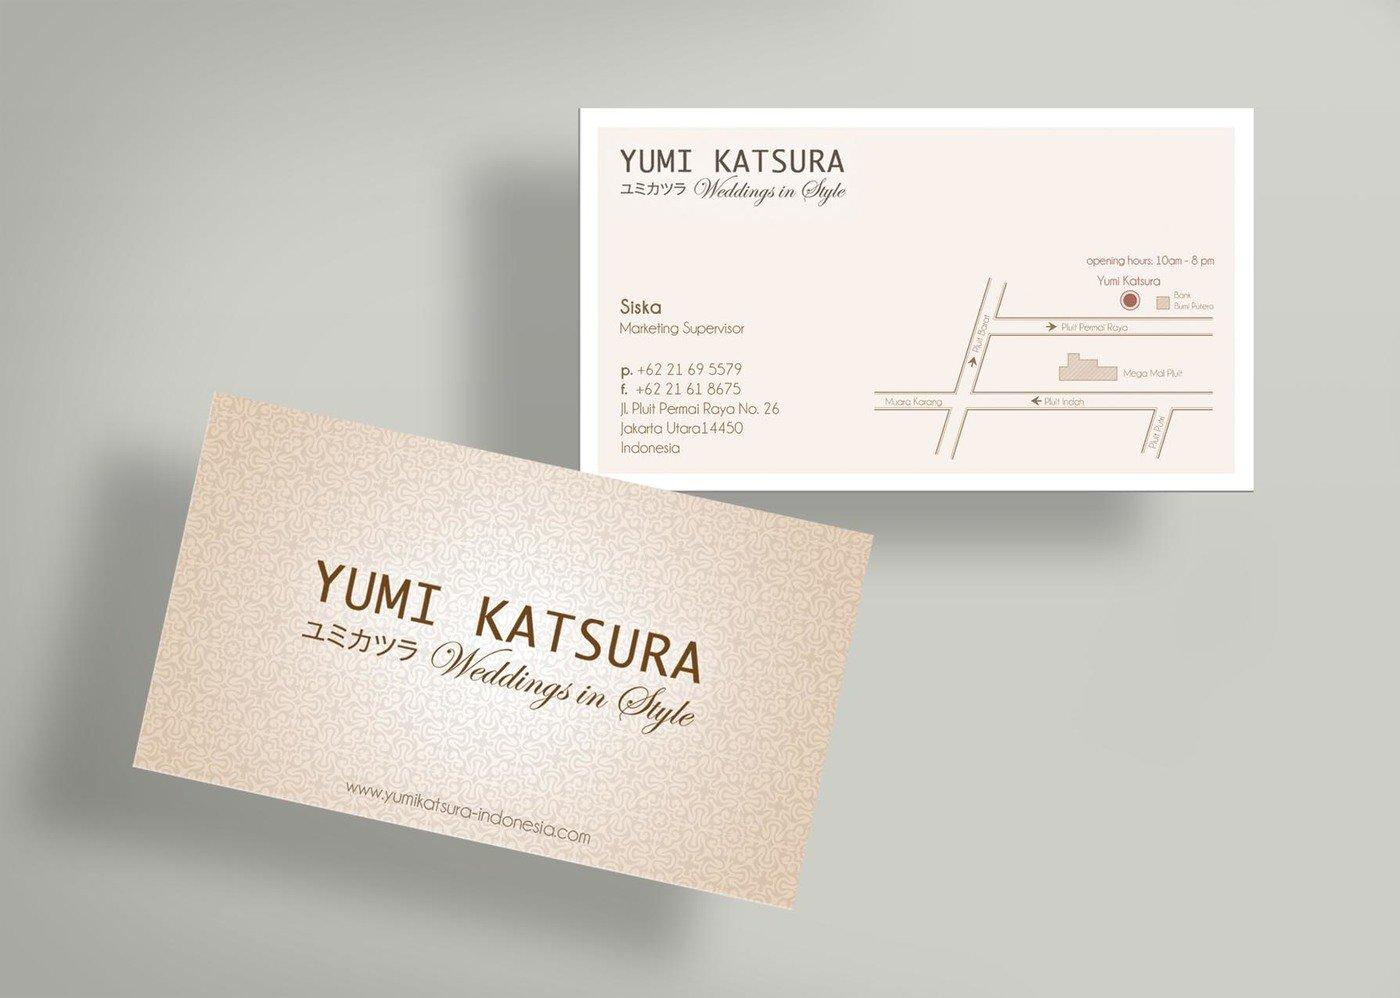 Yumi Katsura - Business Card & Price Tag Design by Sherly Gunawan ...